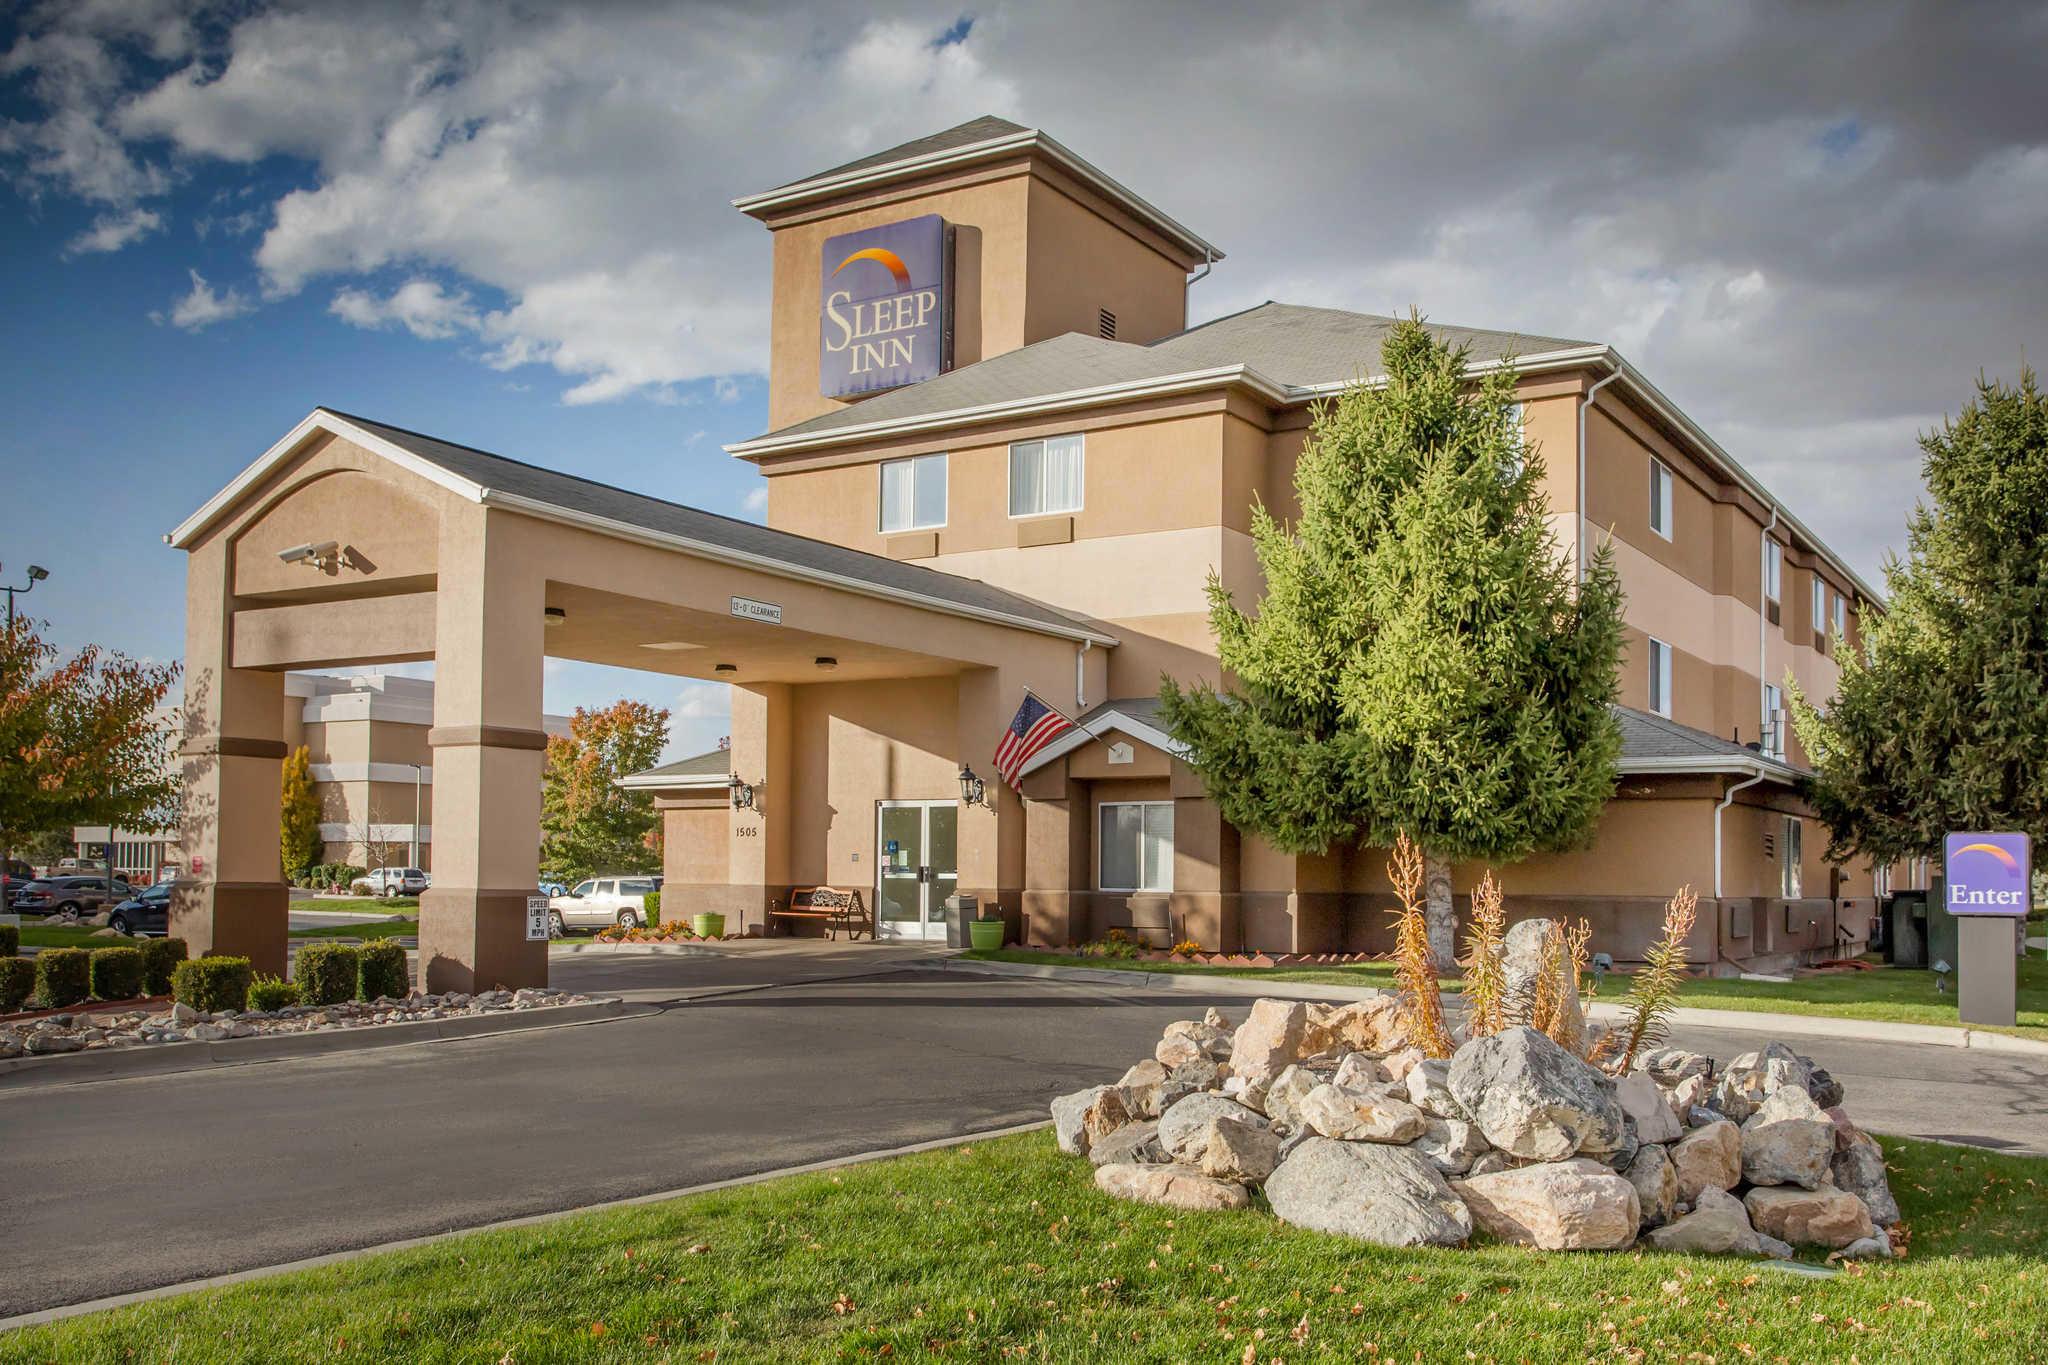 Provo Pet Friendly Hotels